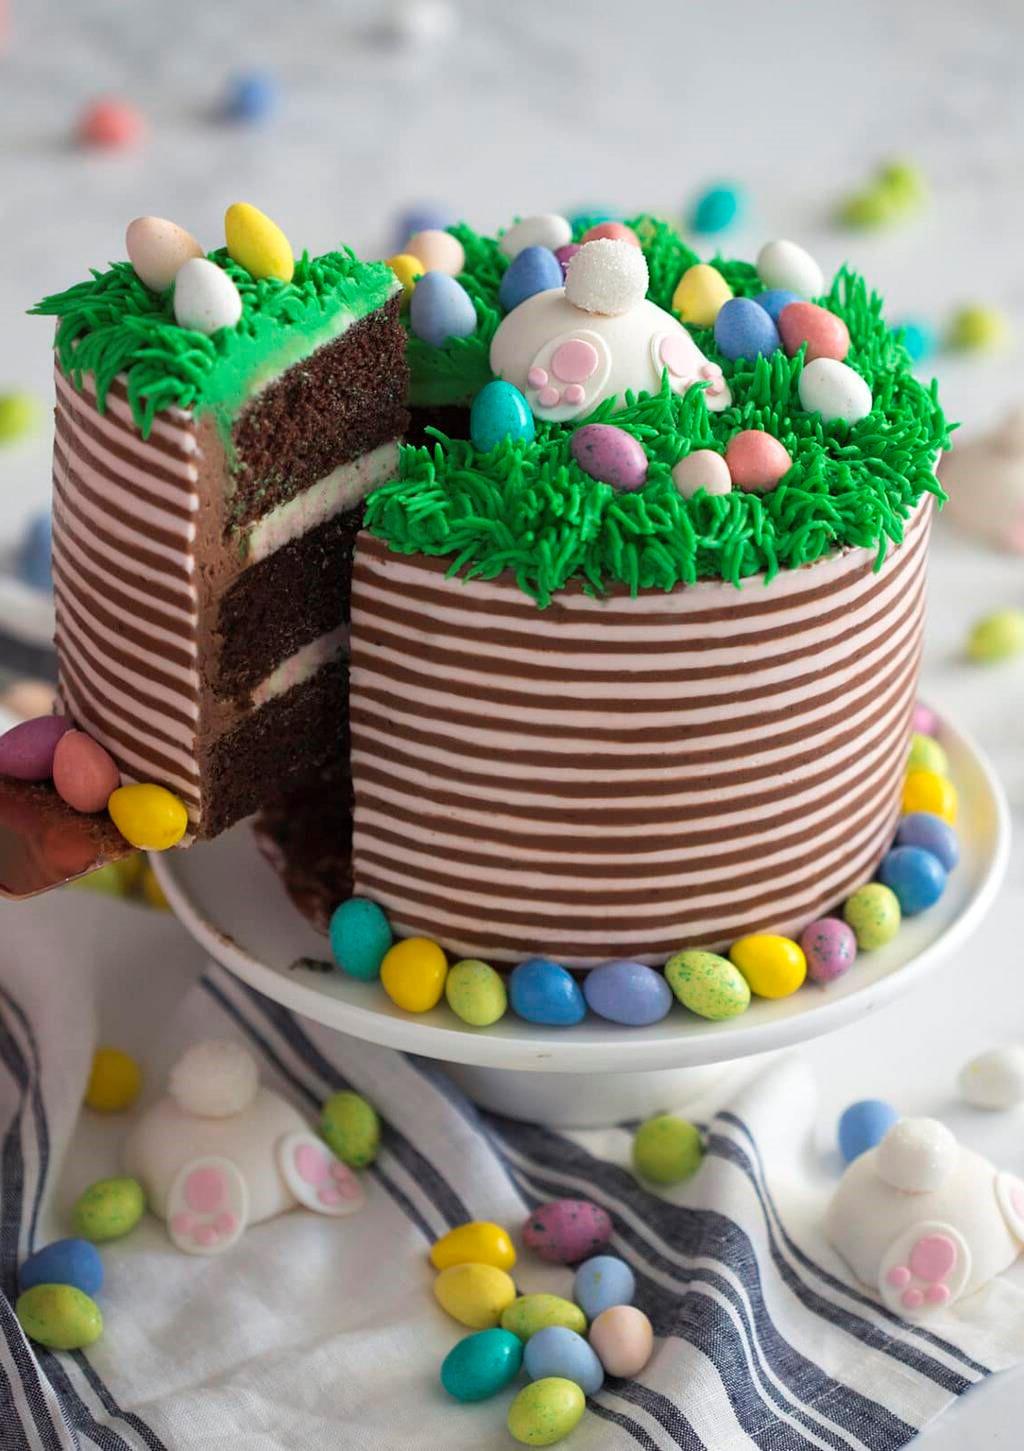 Recette de cake festif.